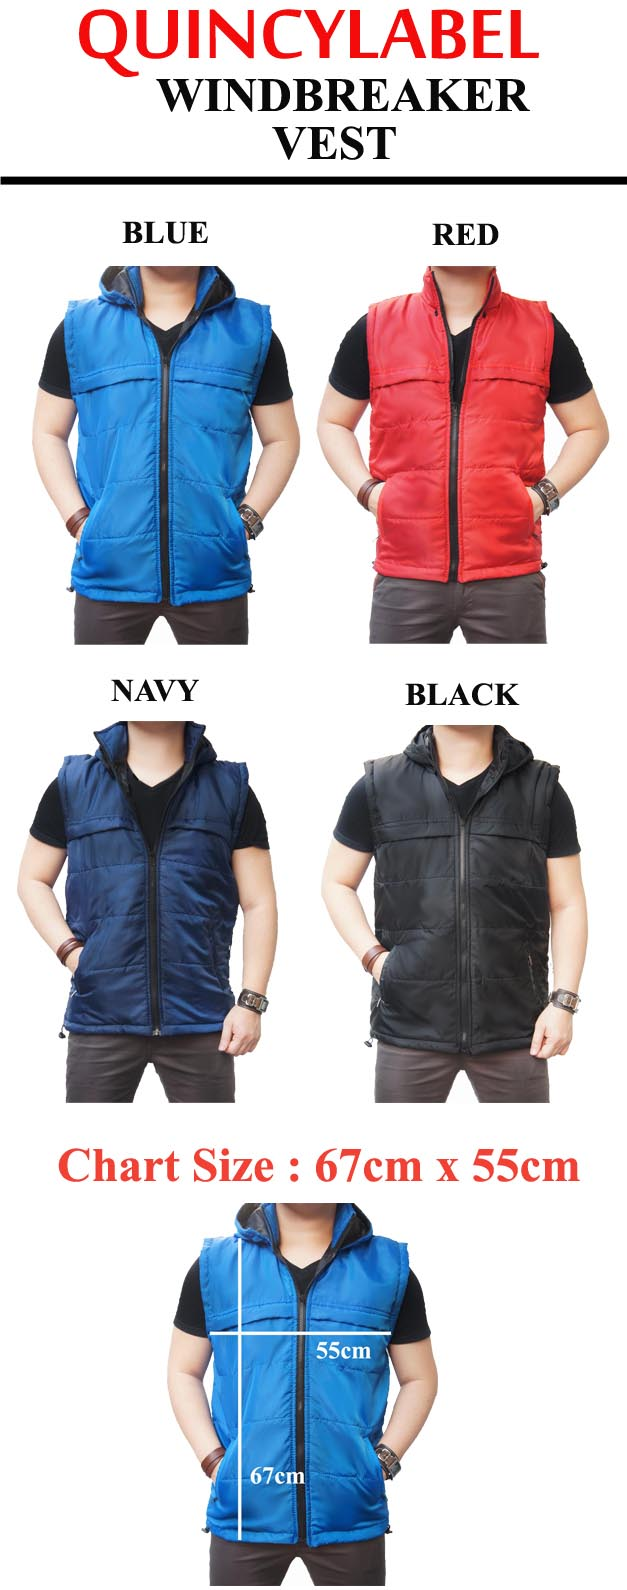 Buy Buy2freeshipquincylabel Windbreaker Vest Collection Jaket Sweater Unisex Pria Wanita High Quality Urgan Jacket